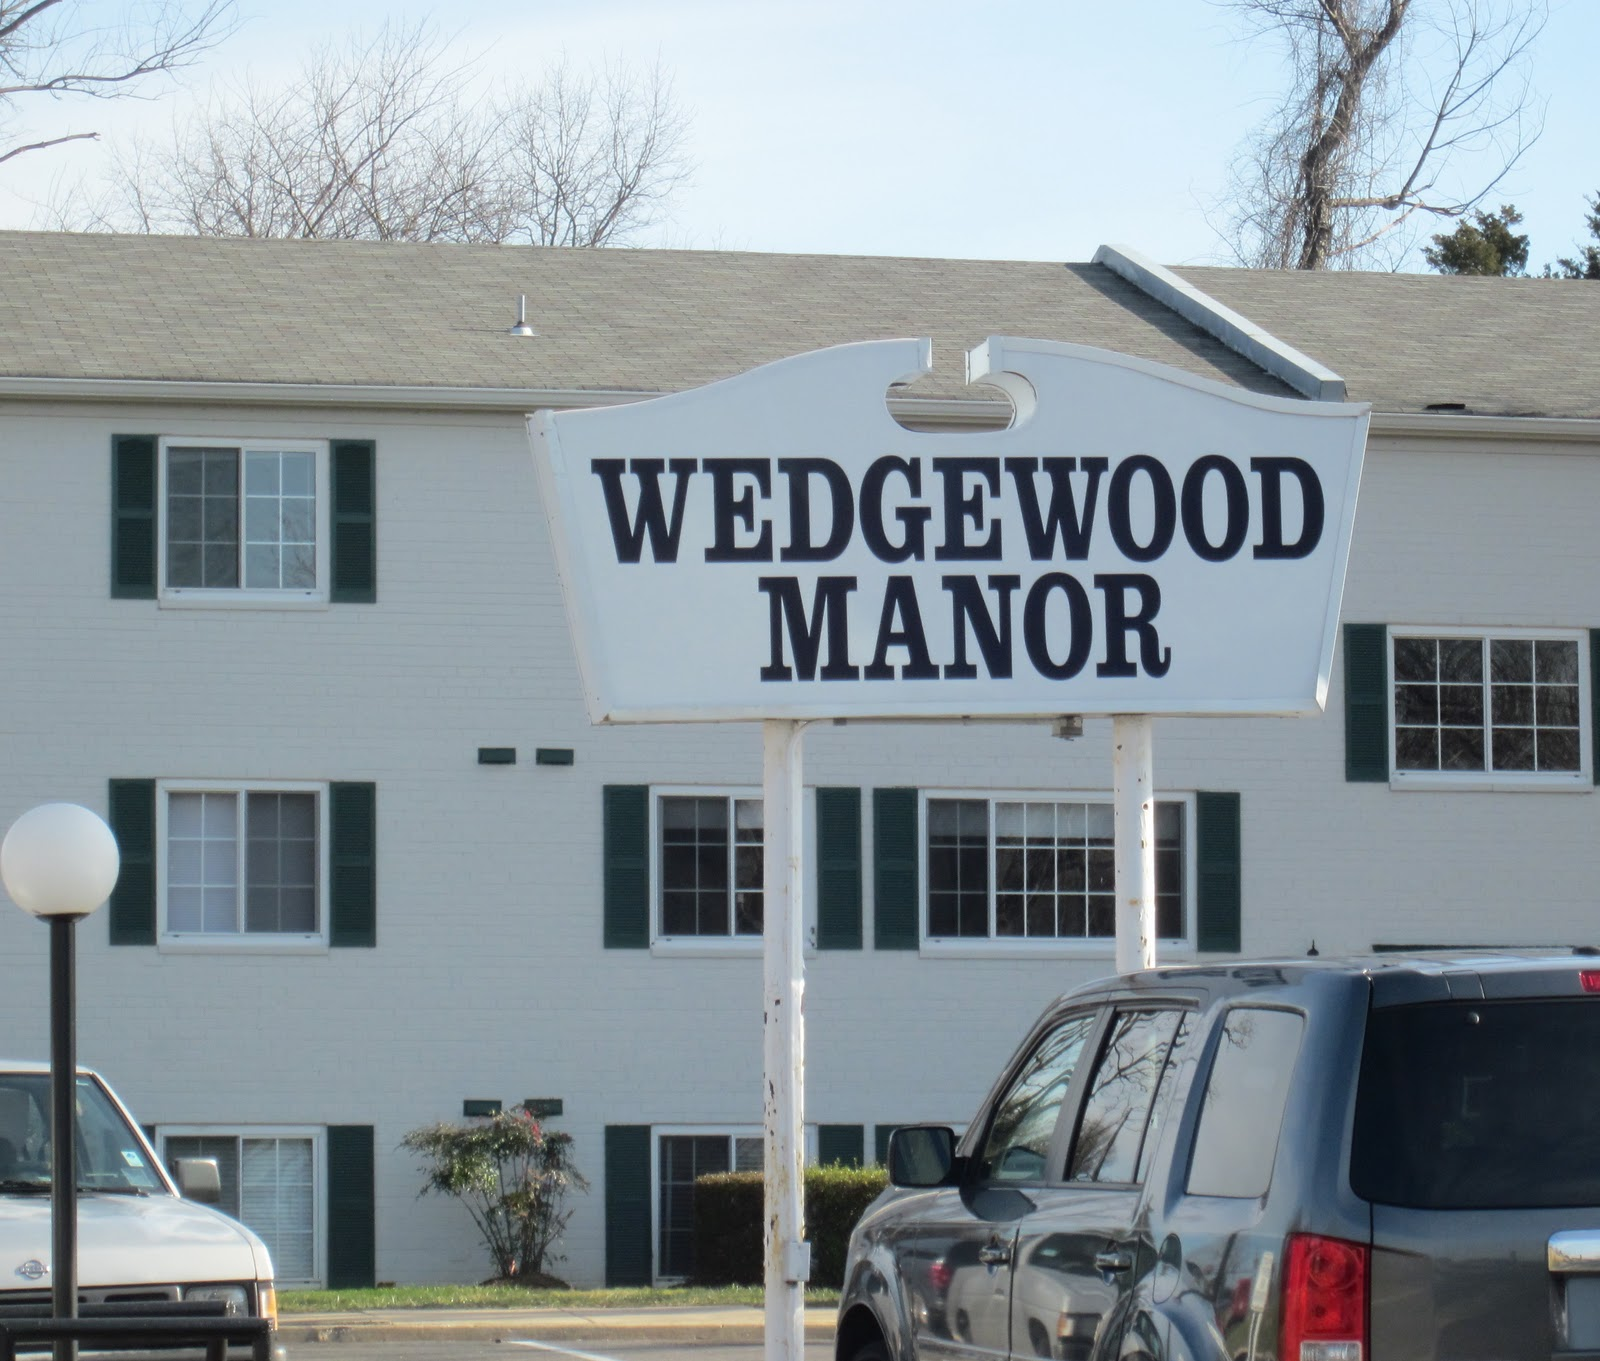 The Annandale Blog: Neighborhood Spotlight: The Wedgewood